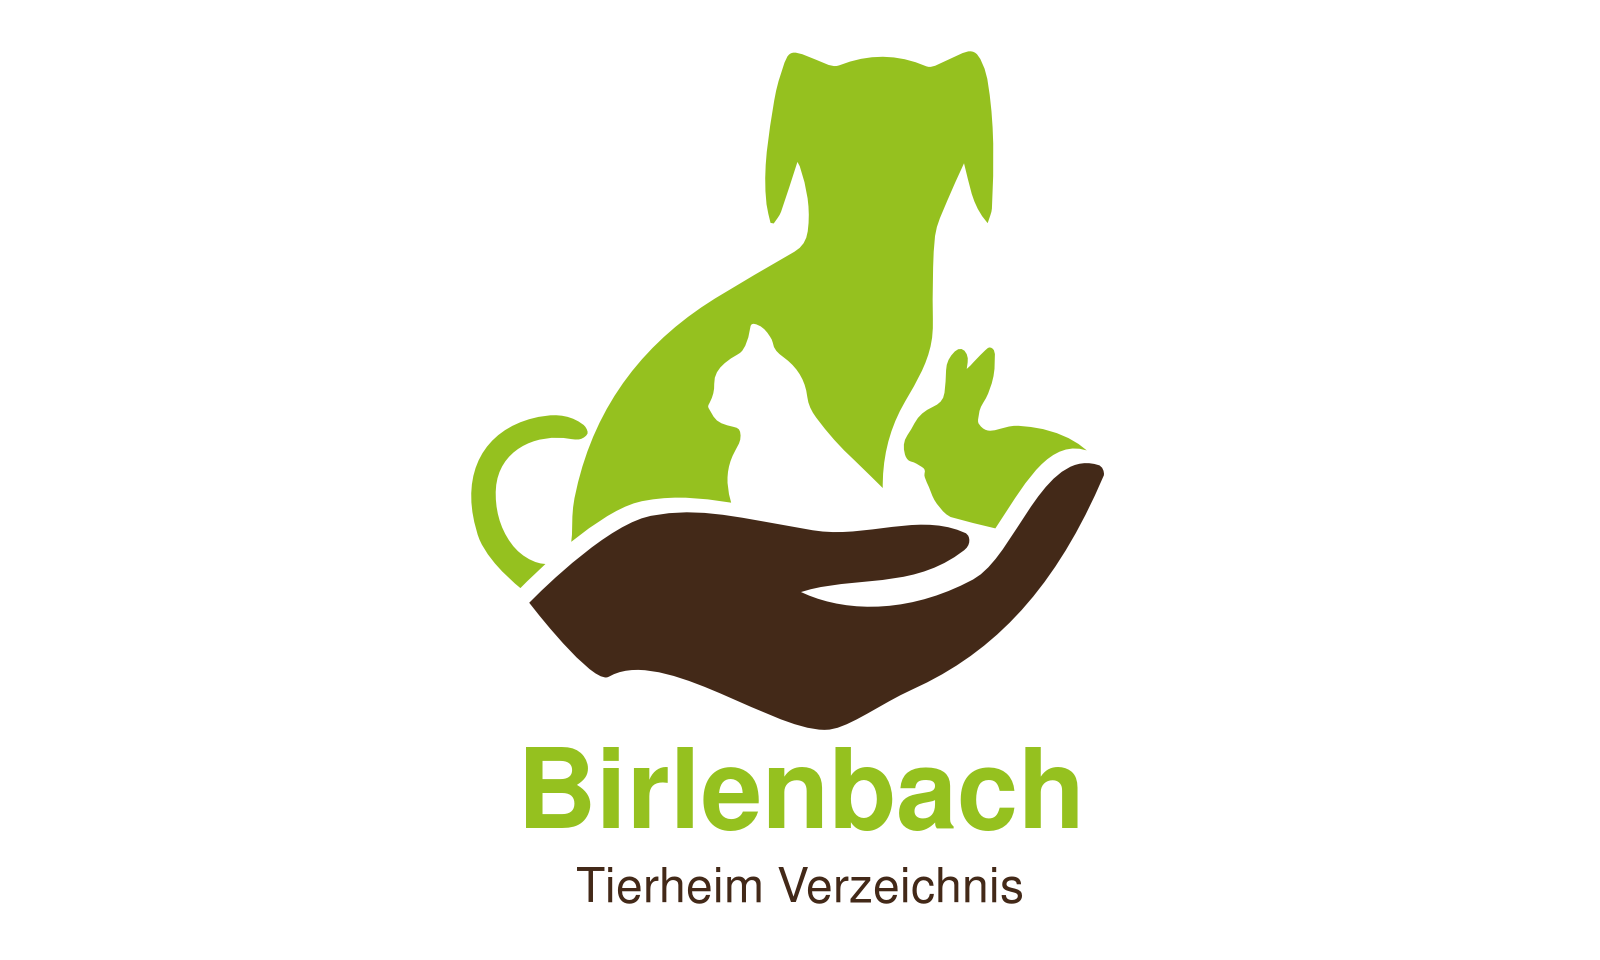 Tierheim Birlenbach